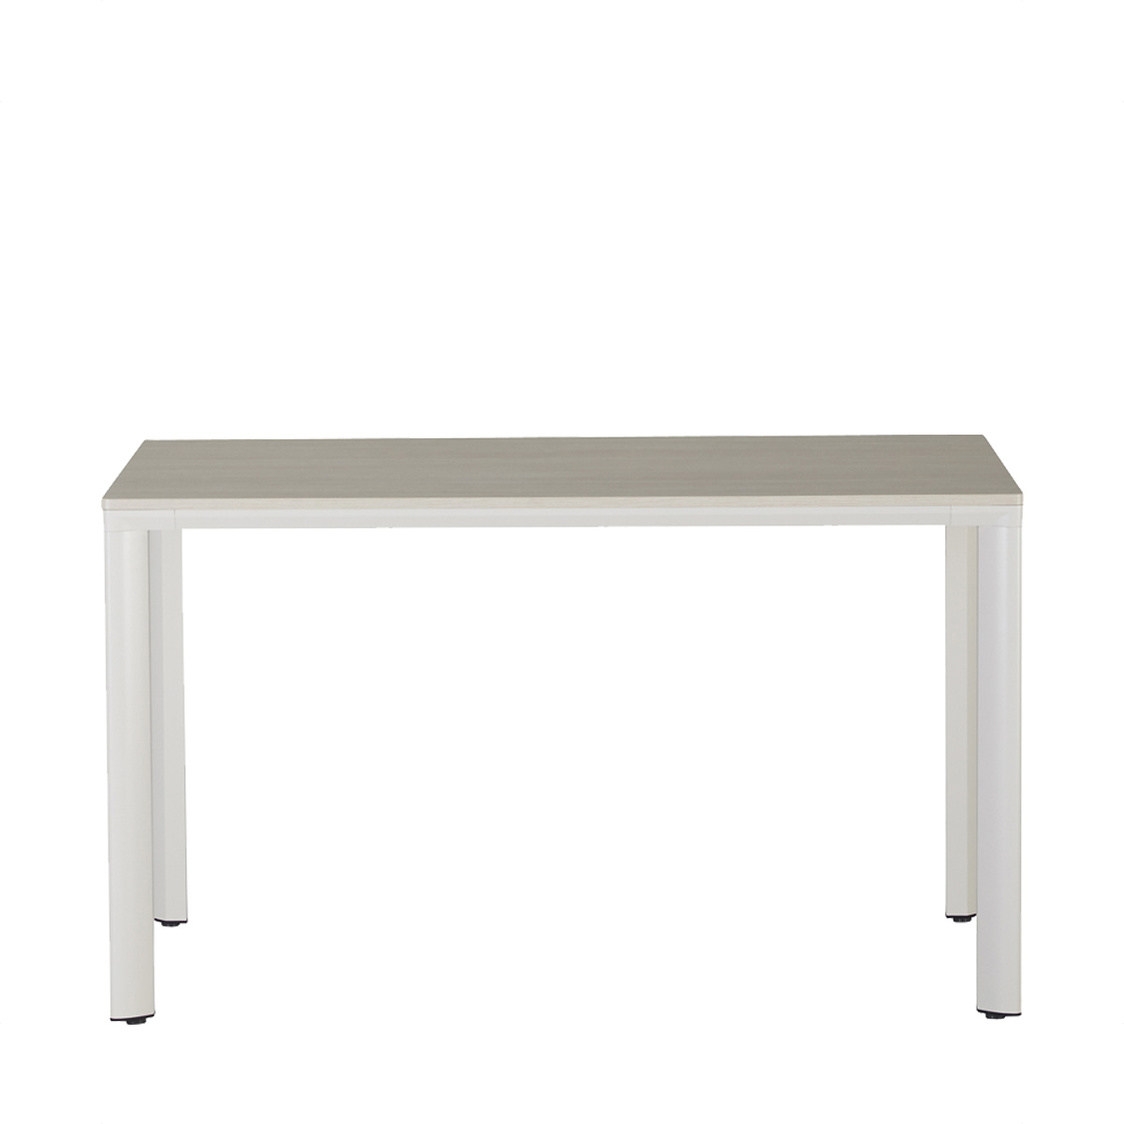 Iloom DELIC Dining Table for 4 LPM HT11T13EL-OSIIV